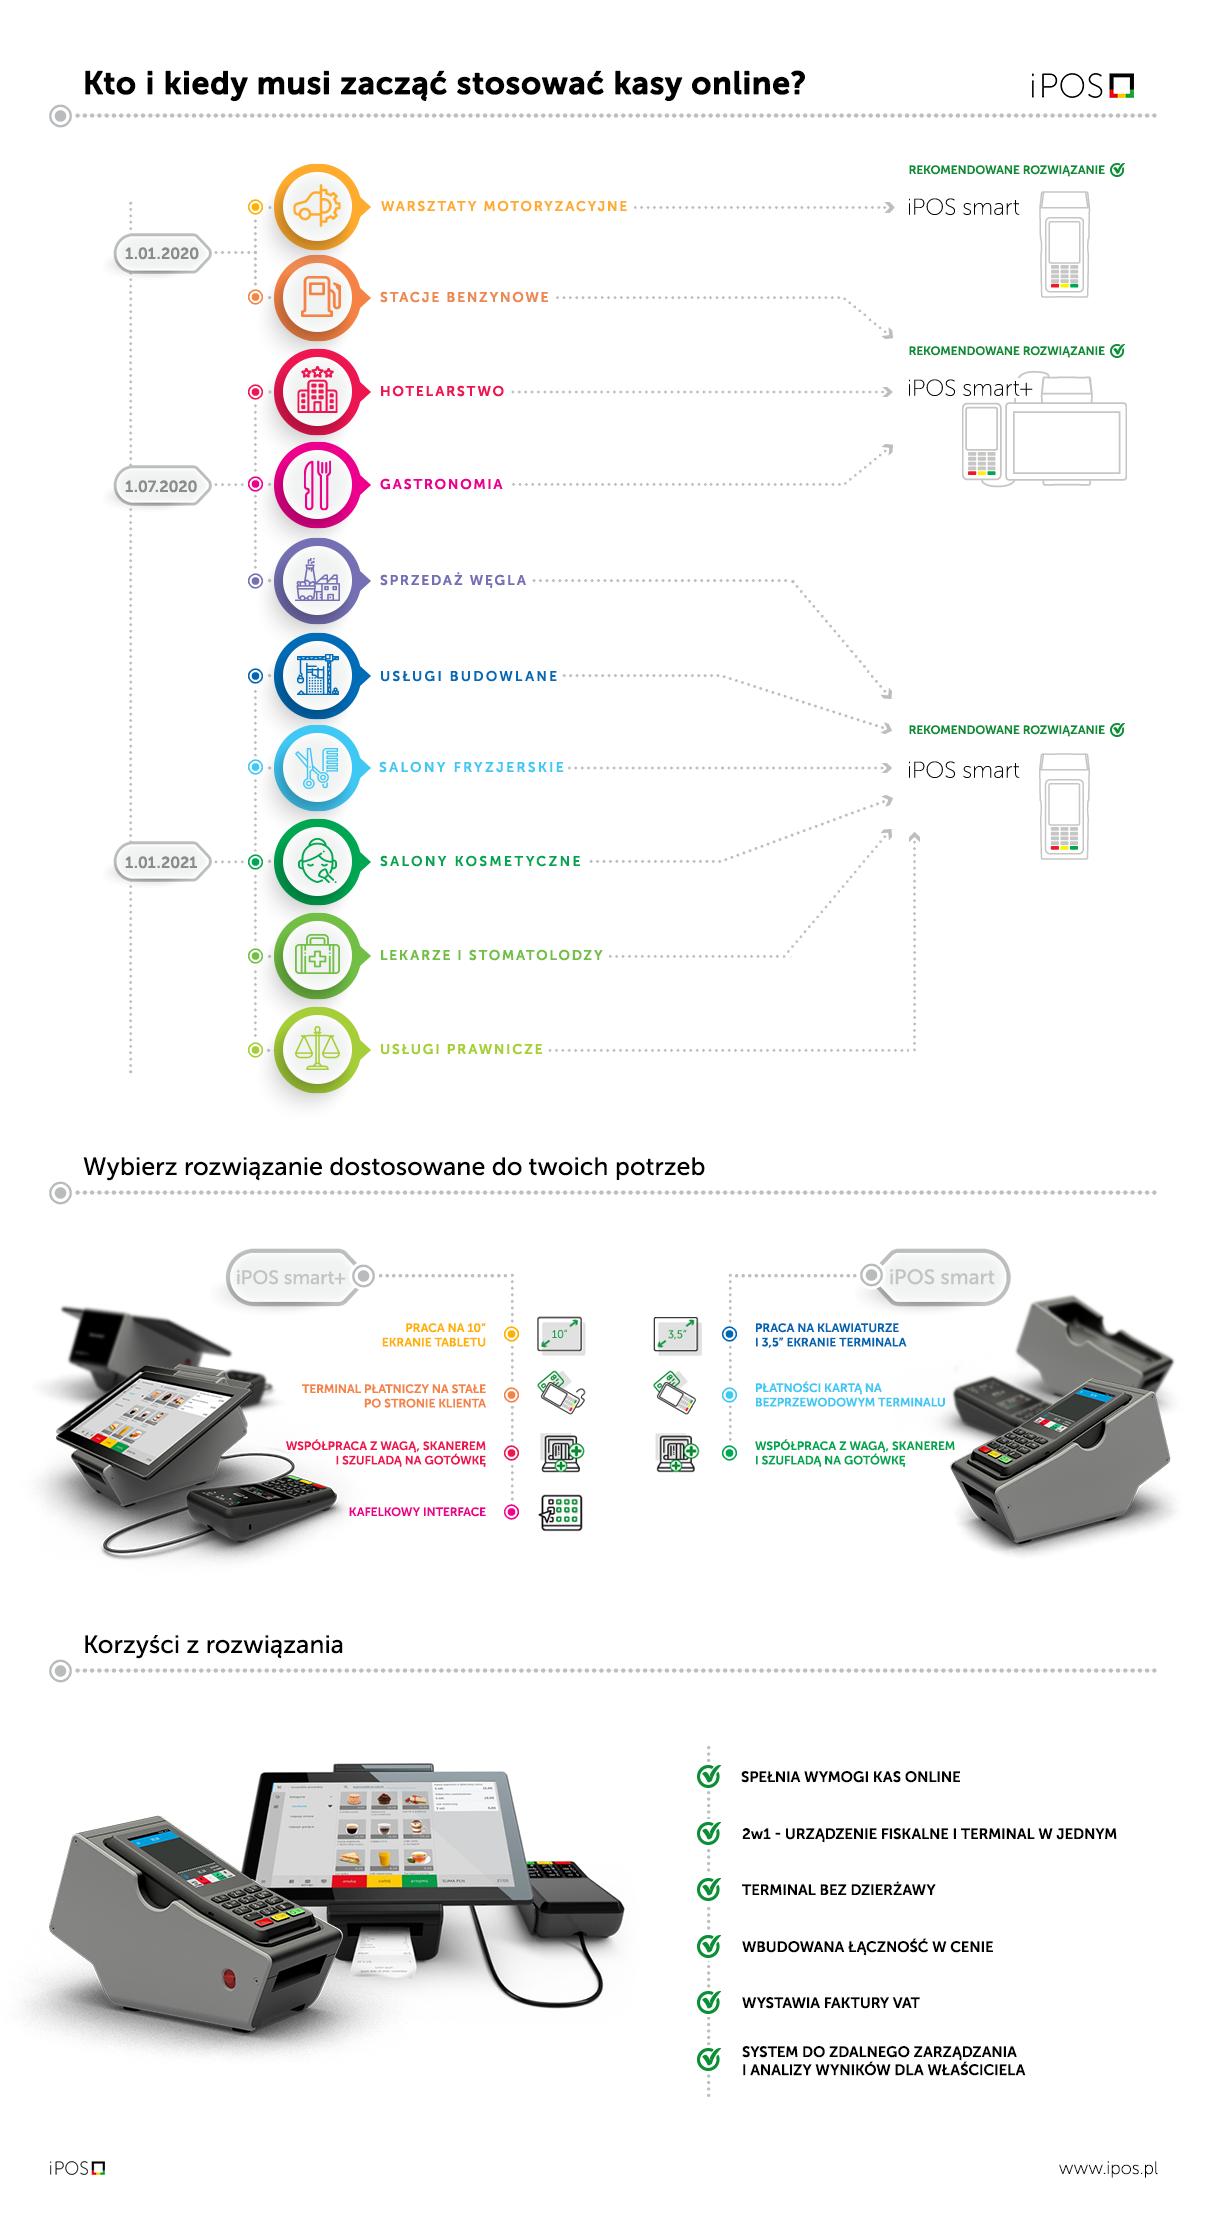 kasoterminal, infografika, kasy online, kasy fiskalne